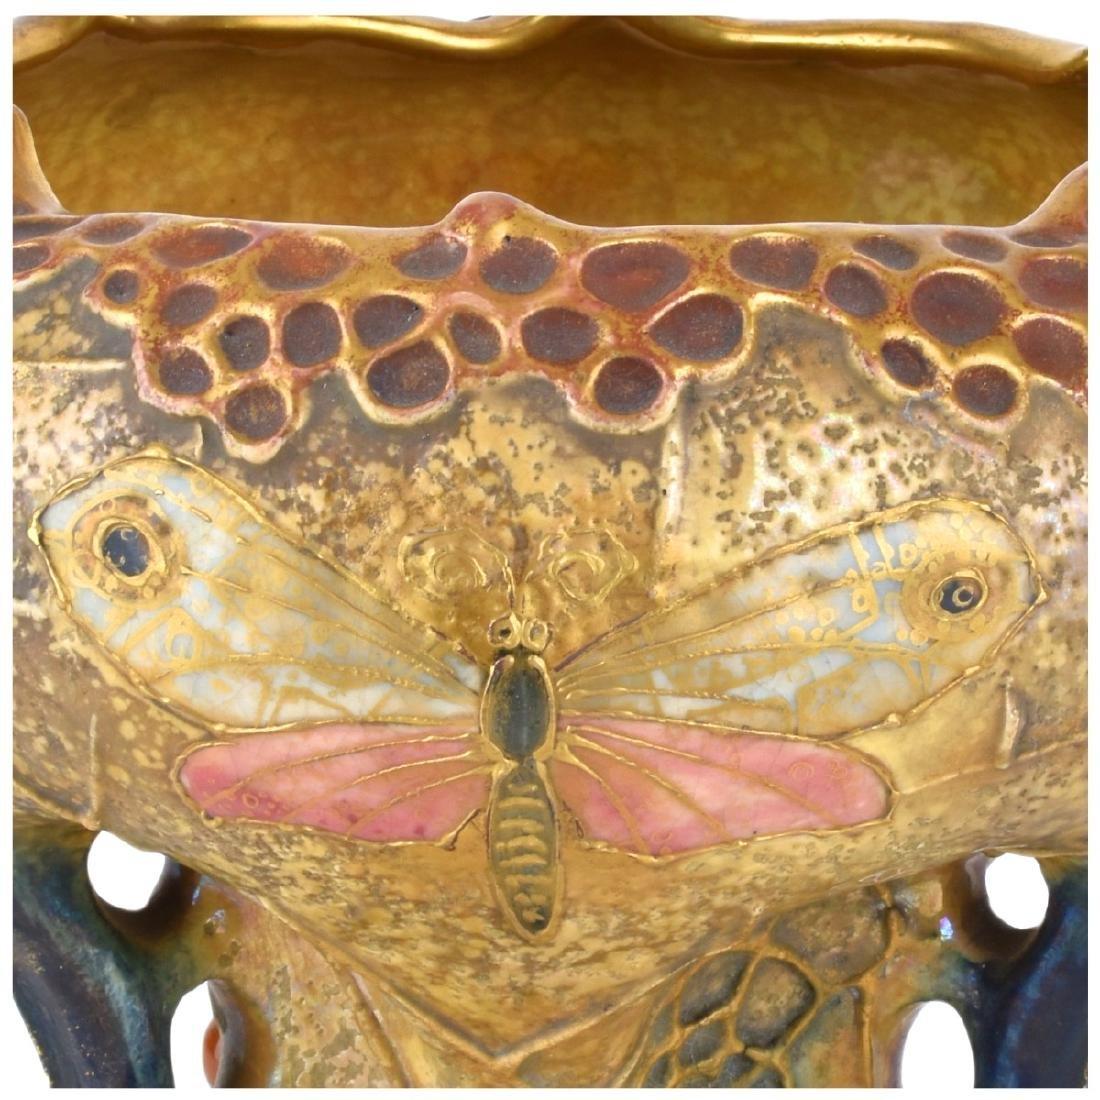 Amphora Pottery Spider Web Vase - 3